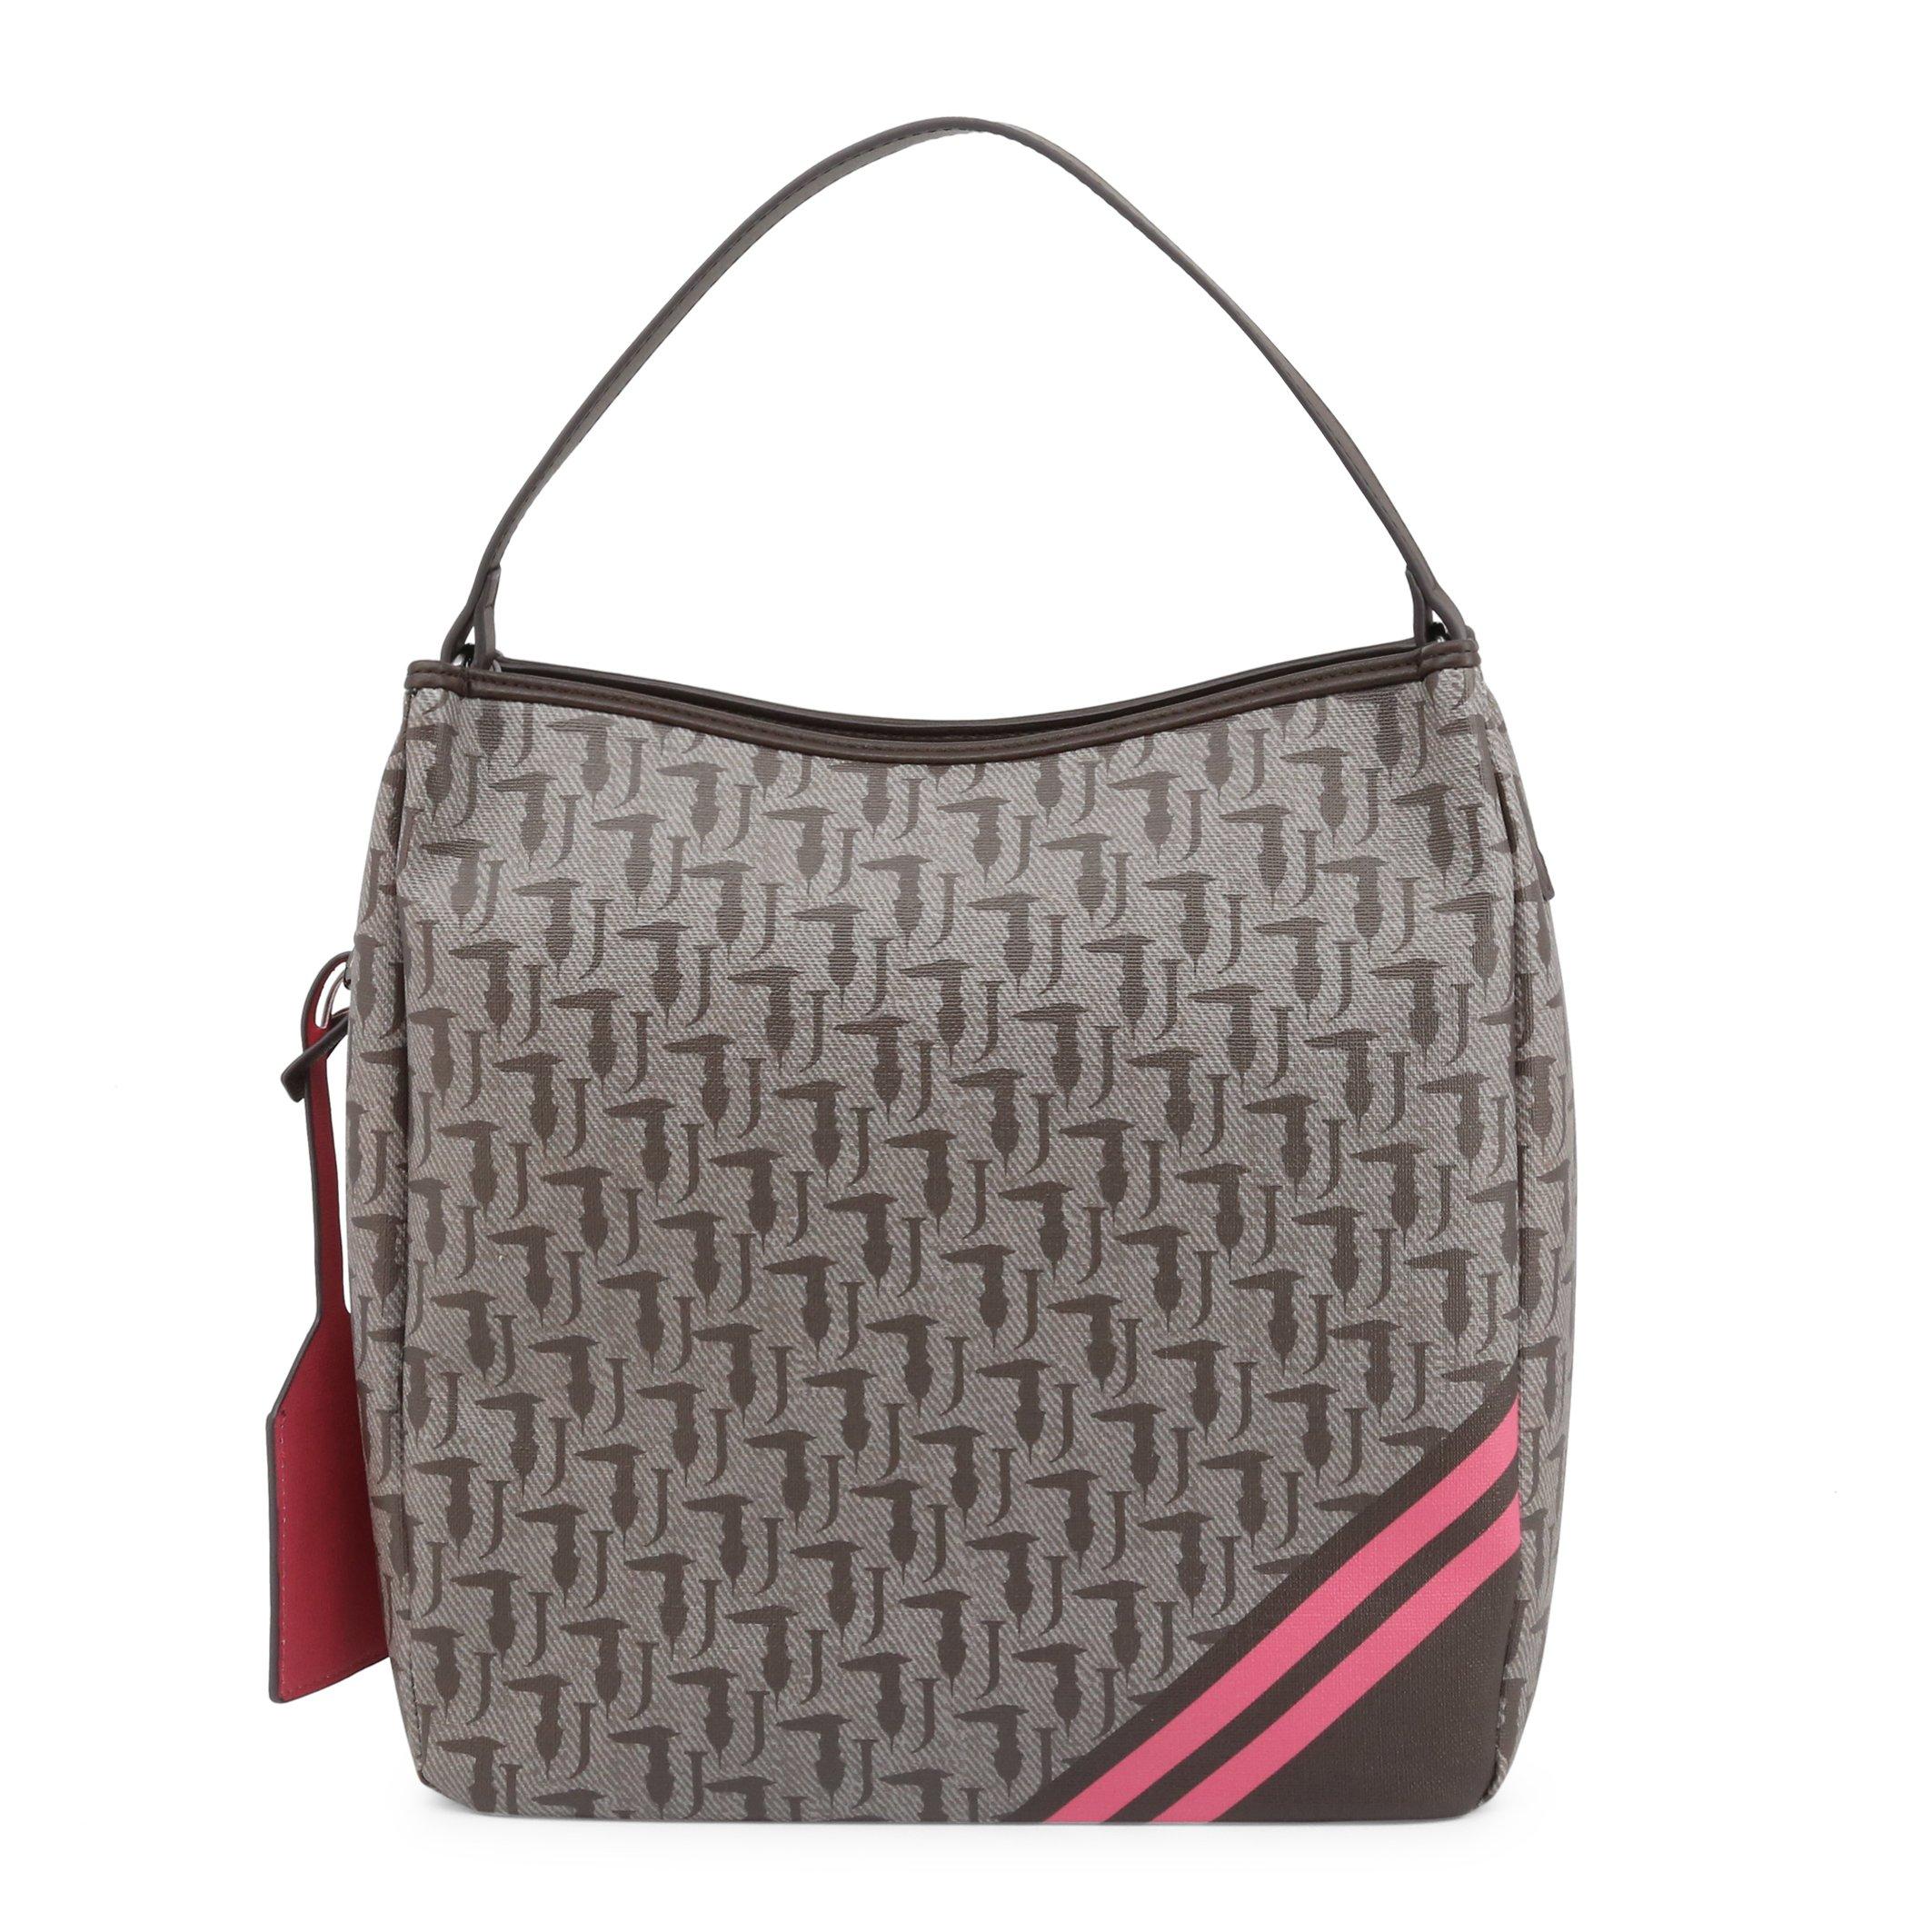 Trussardi Women's Shoulder Bag Brown VANIGLIA_75B00475 - brown-1 NOSIZE